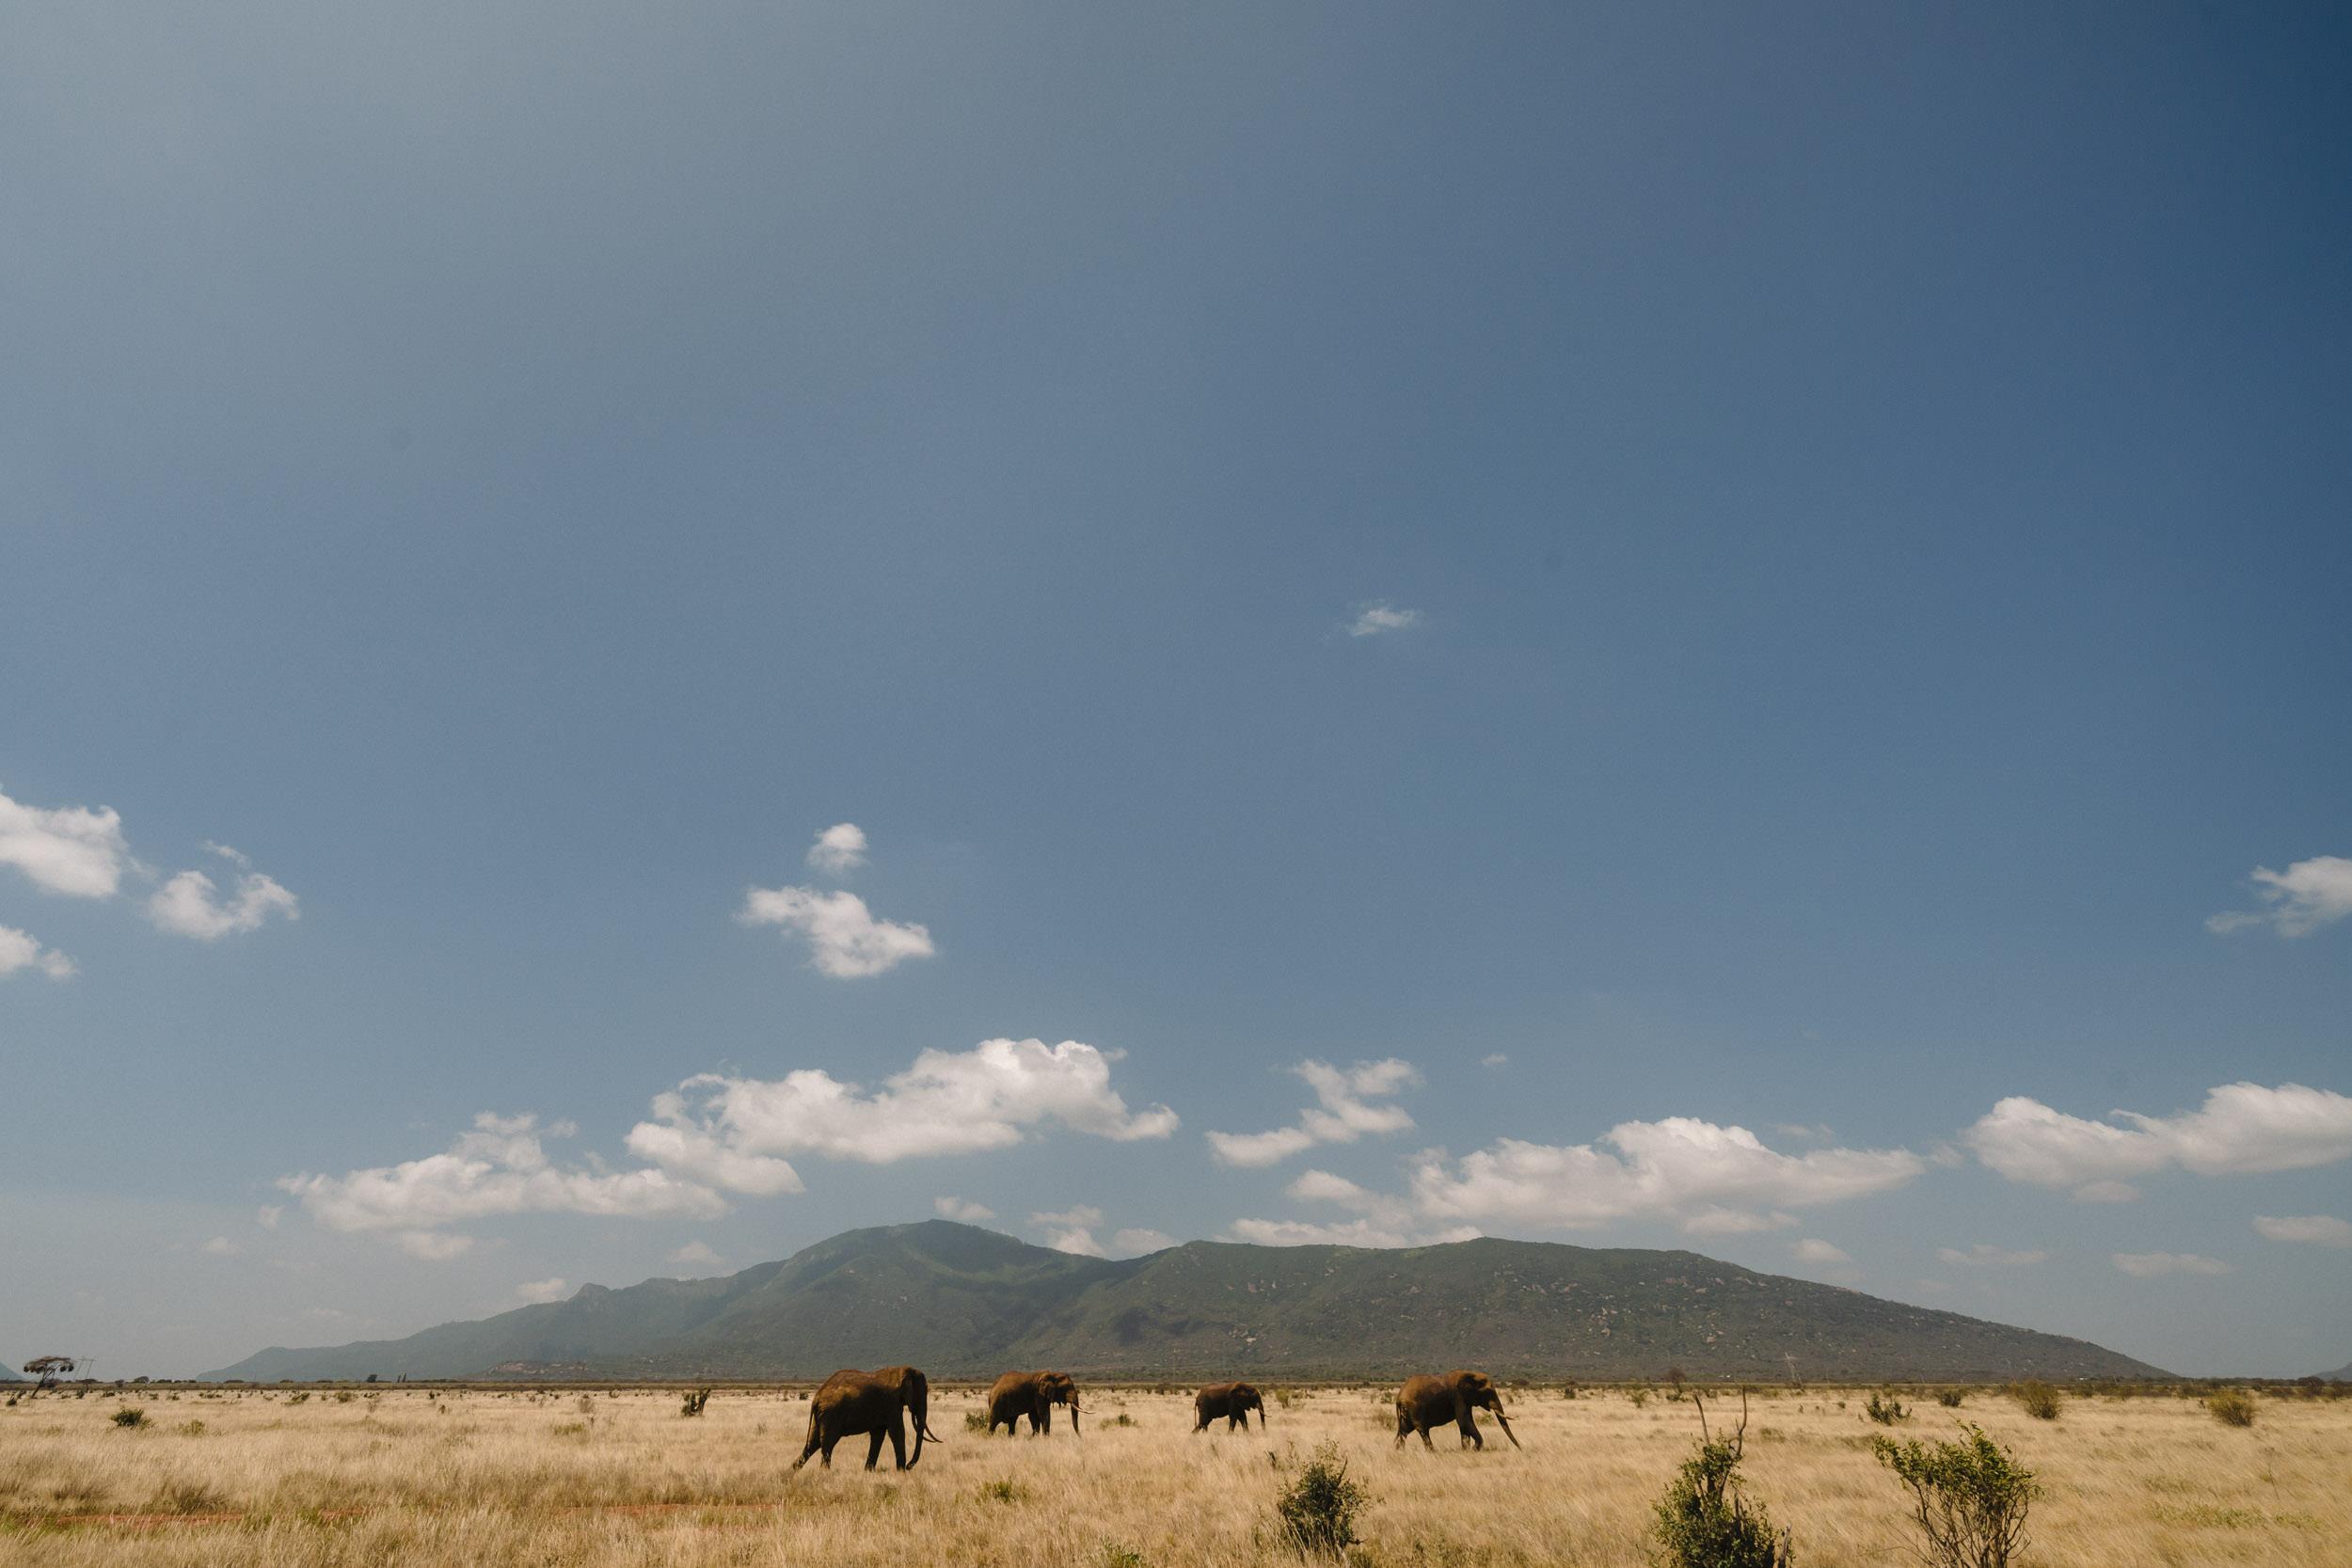 elephants african savannah landscape.jpg